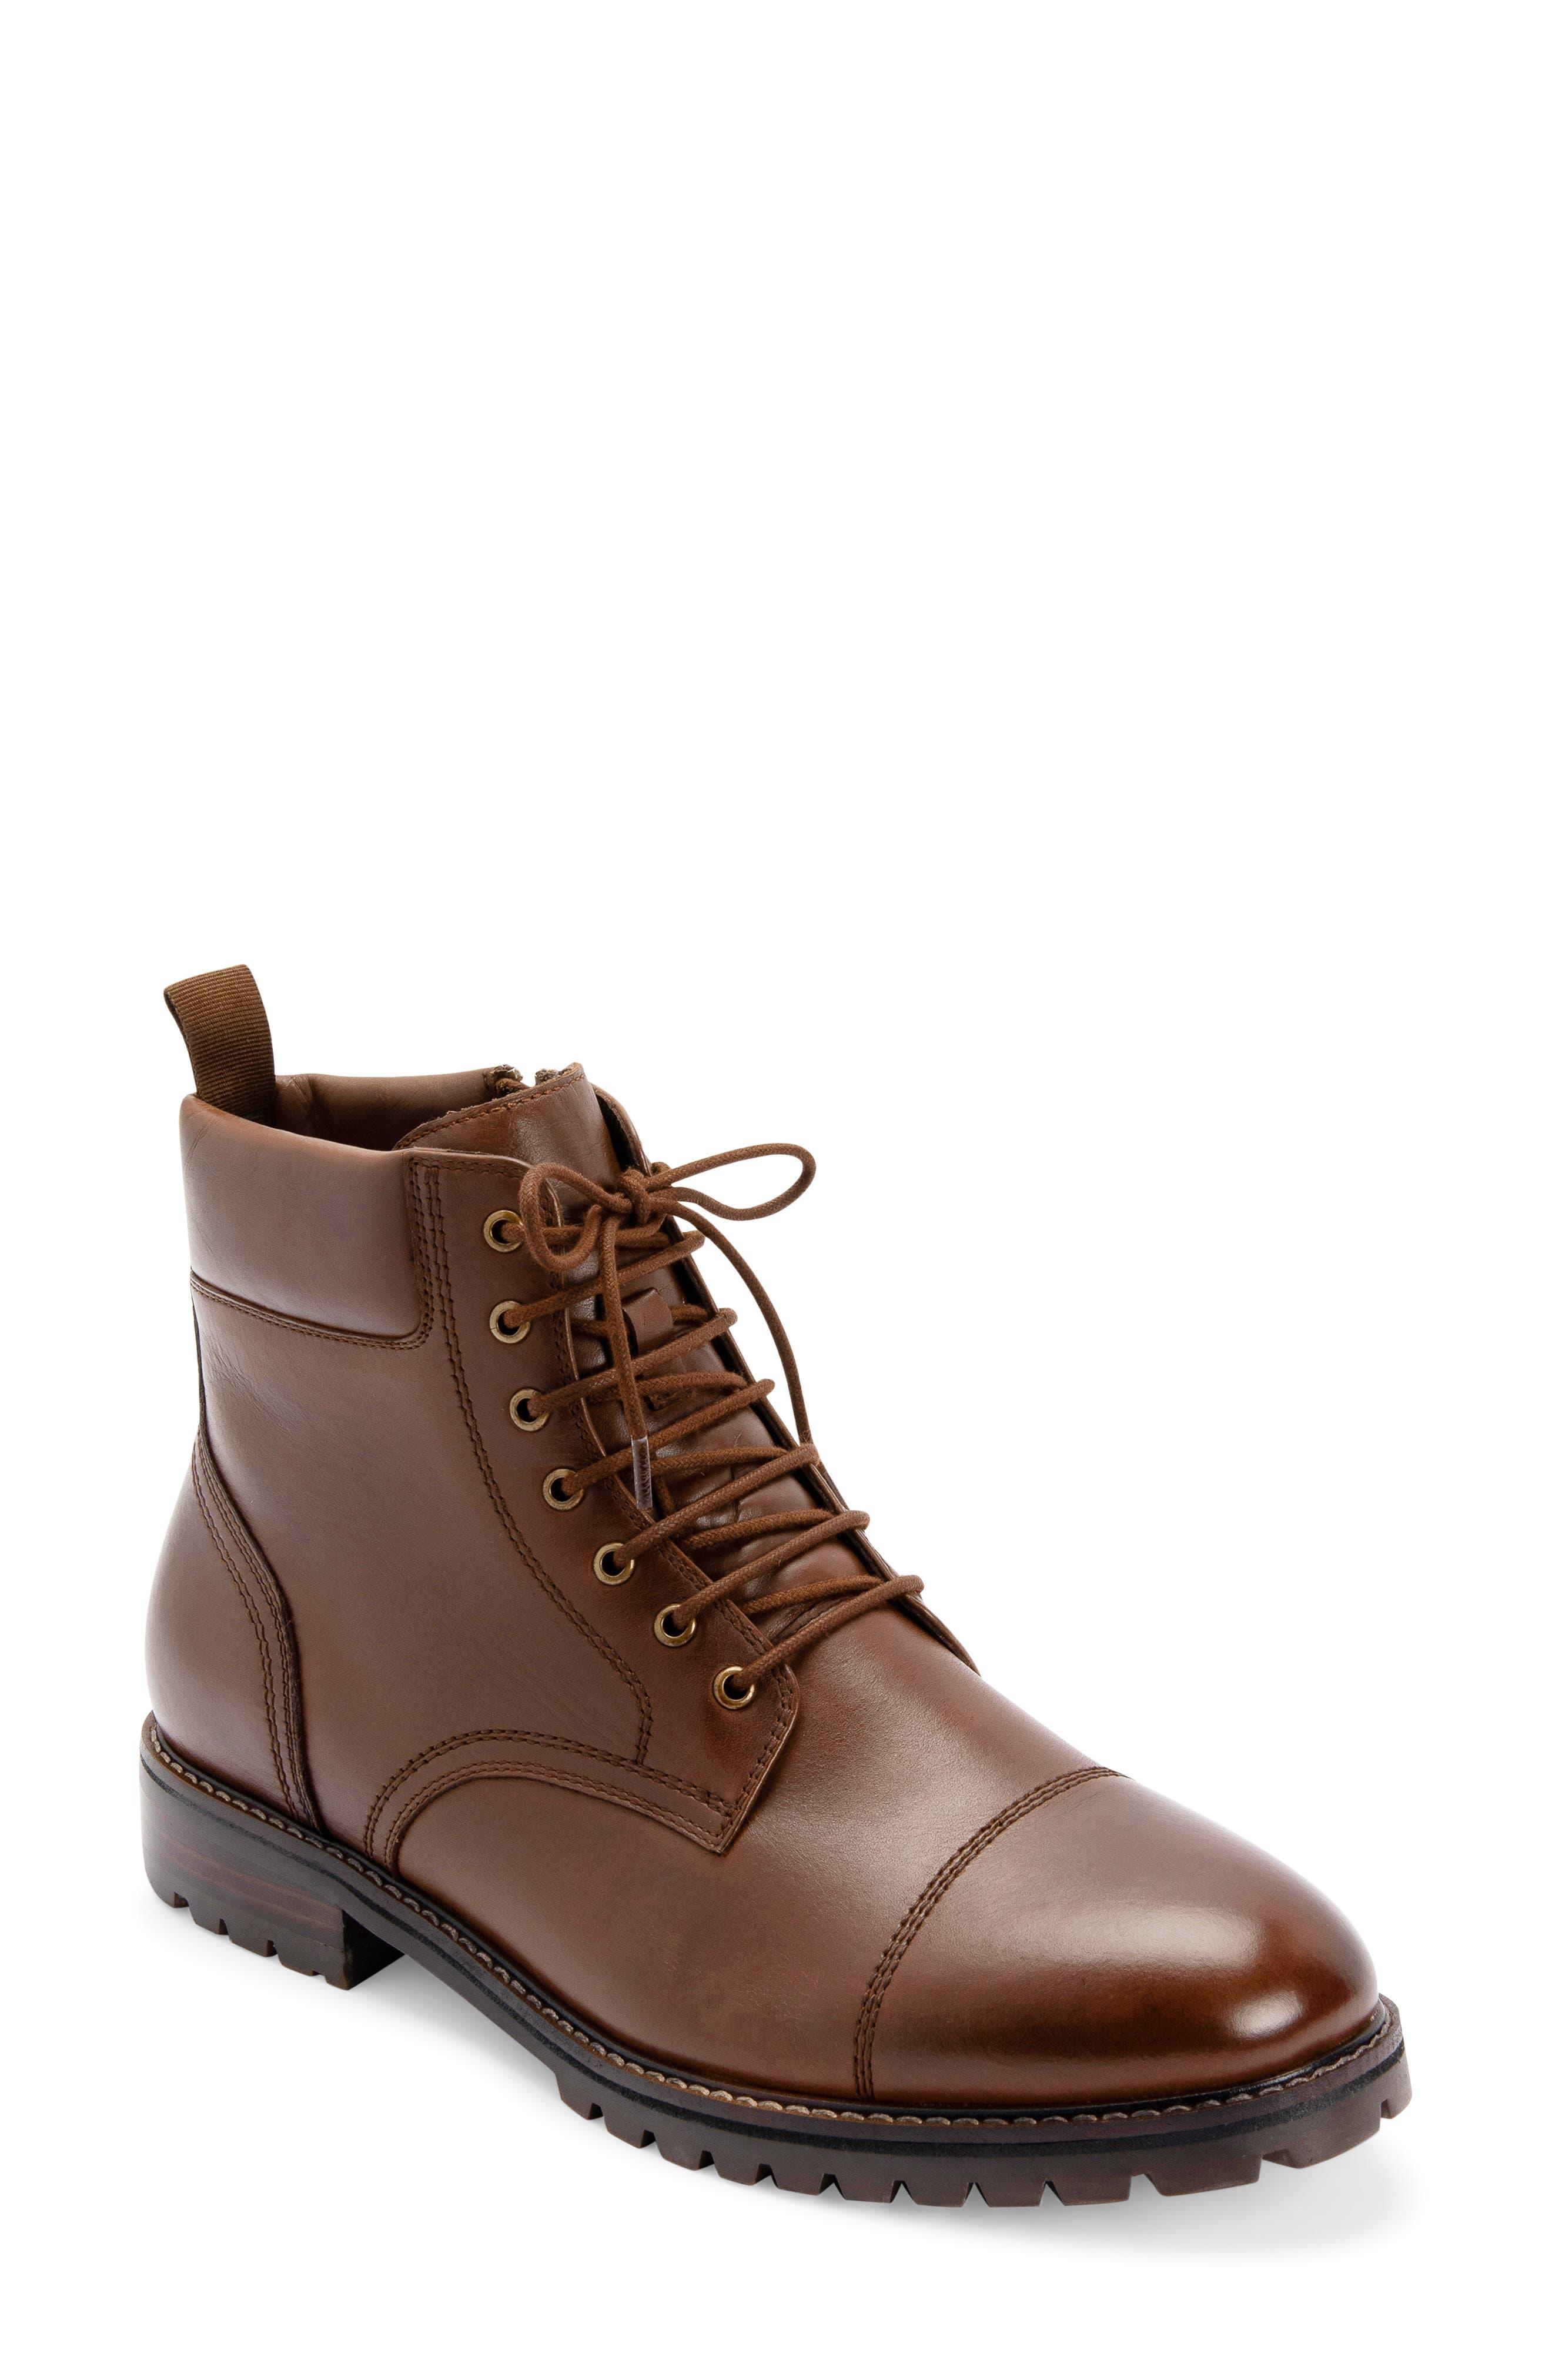 Laurence Waterproof Boot